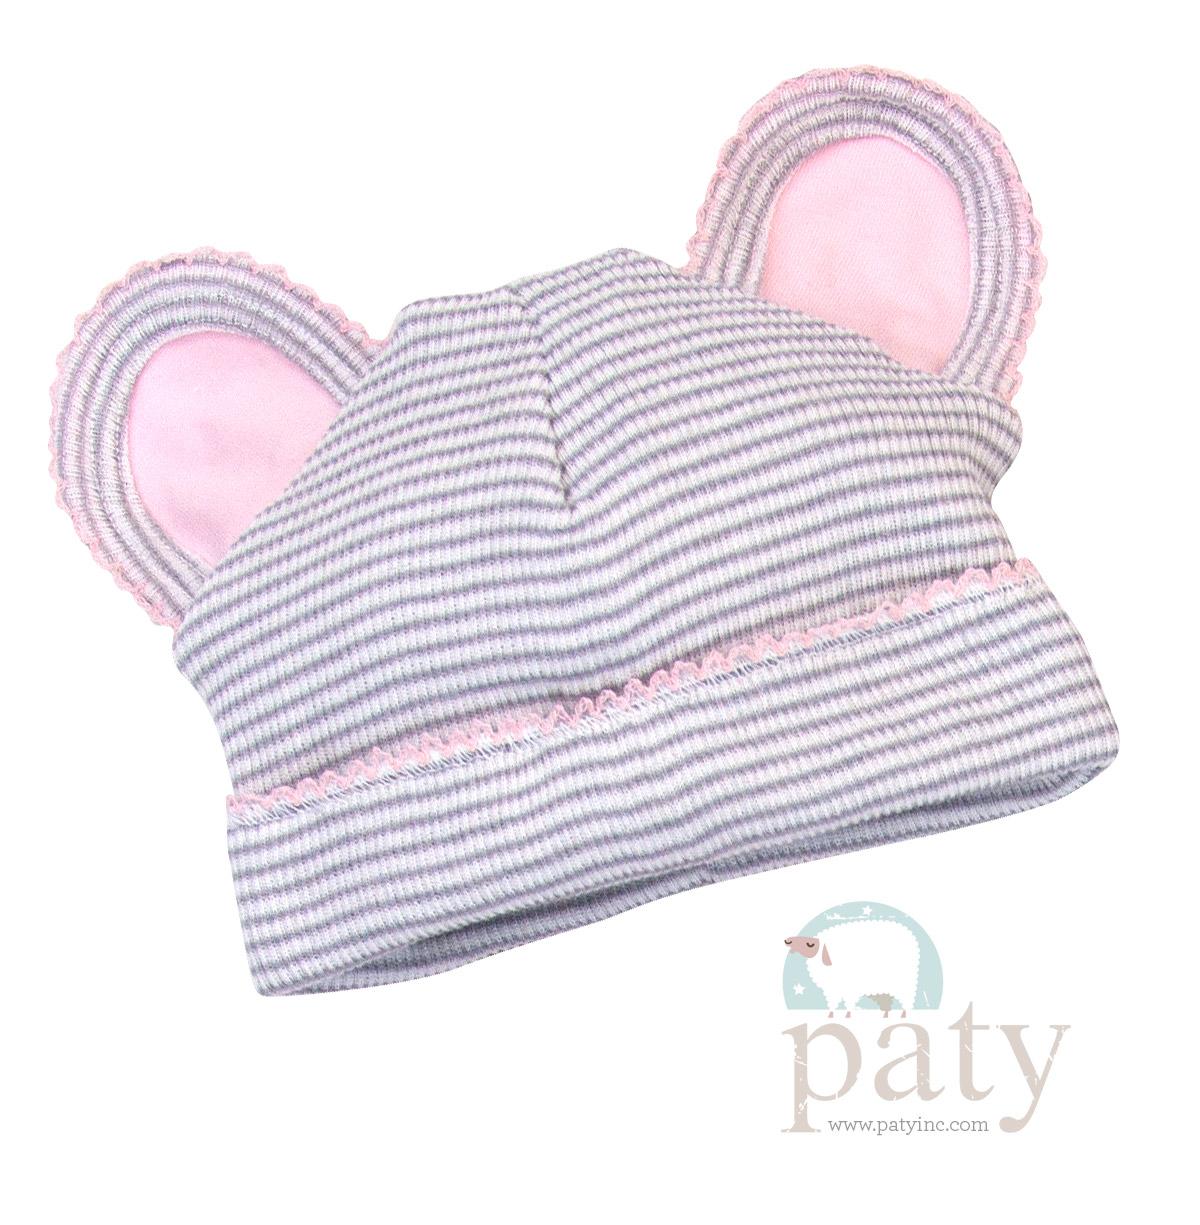 Paty Rib Knit Grey with Pink Trim Bear Cap